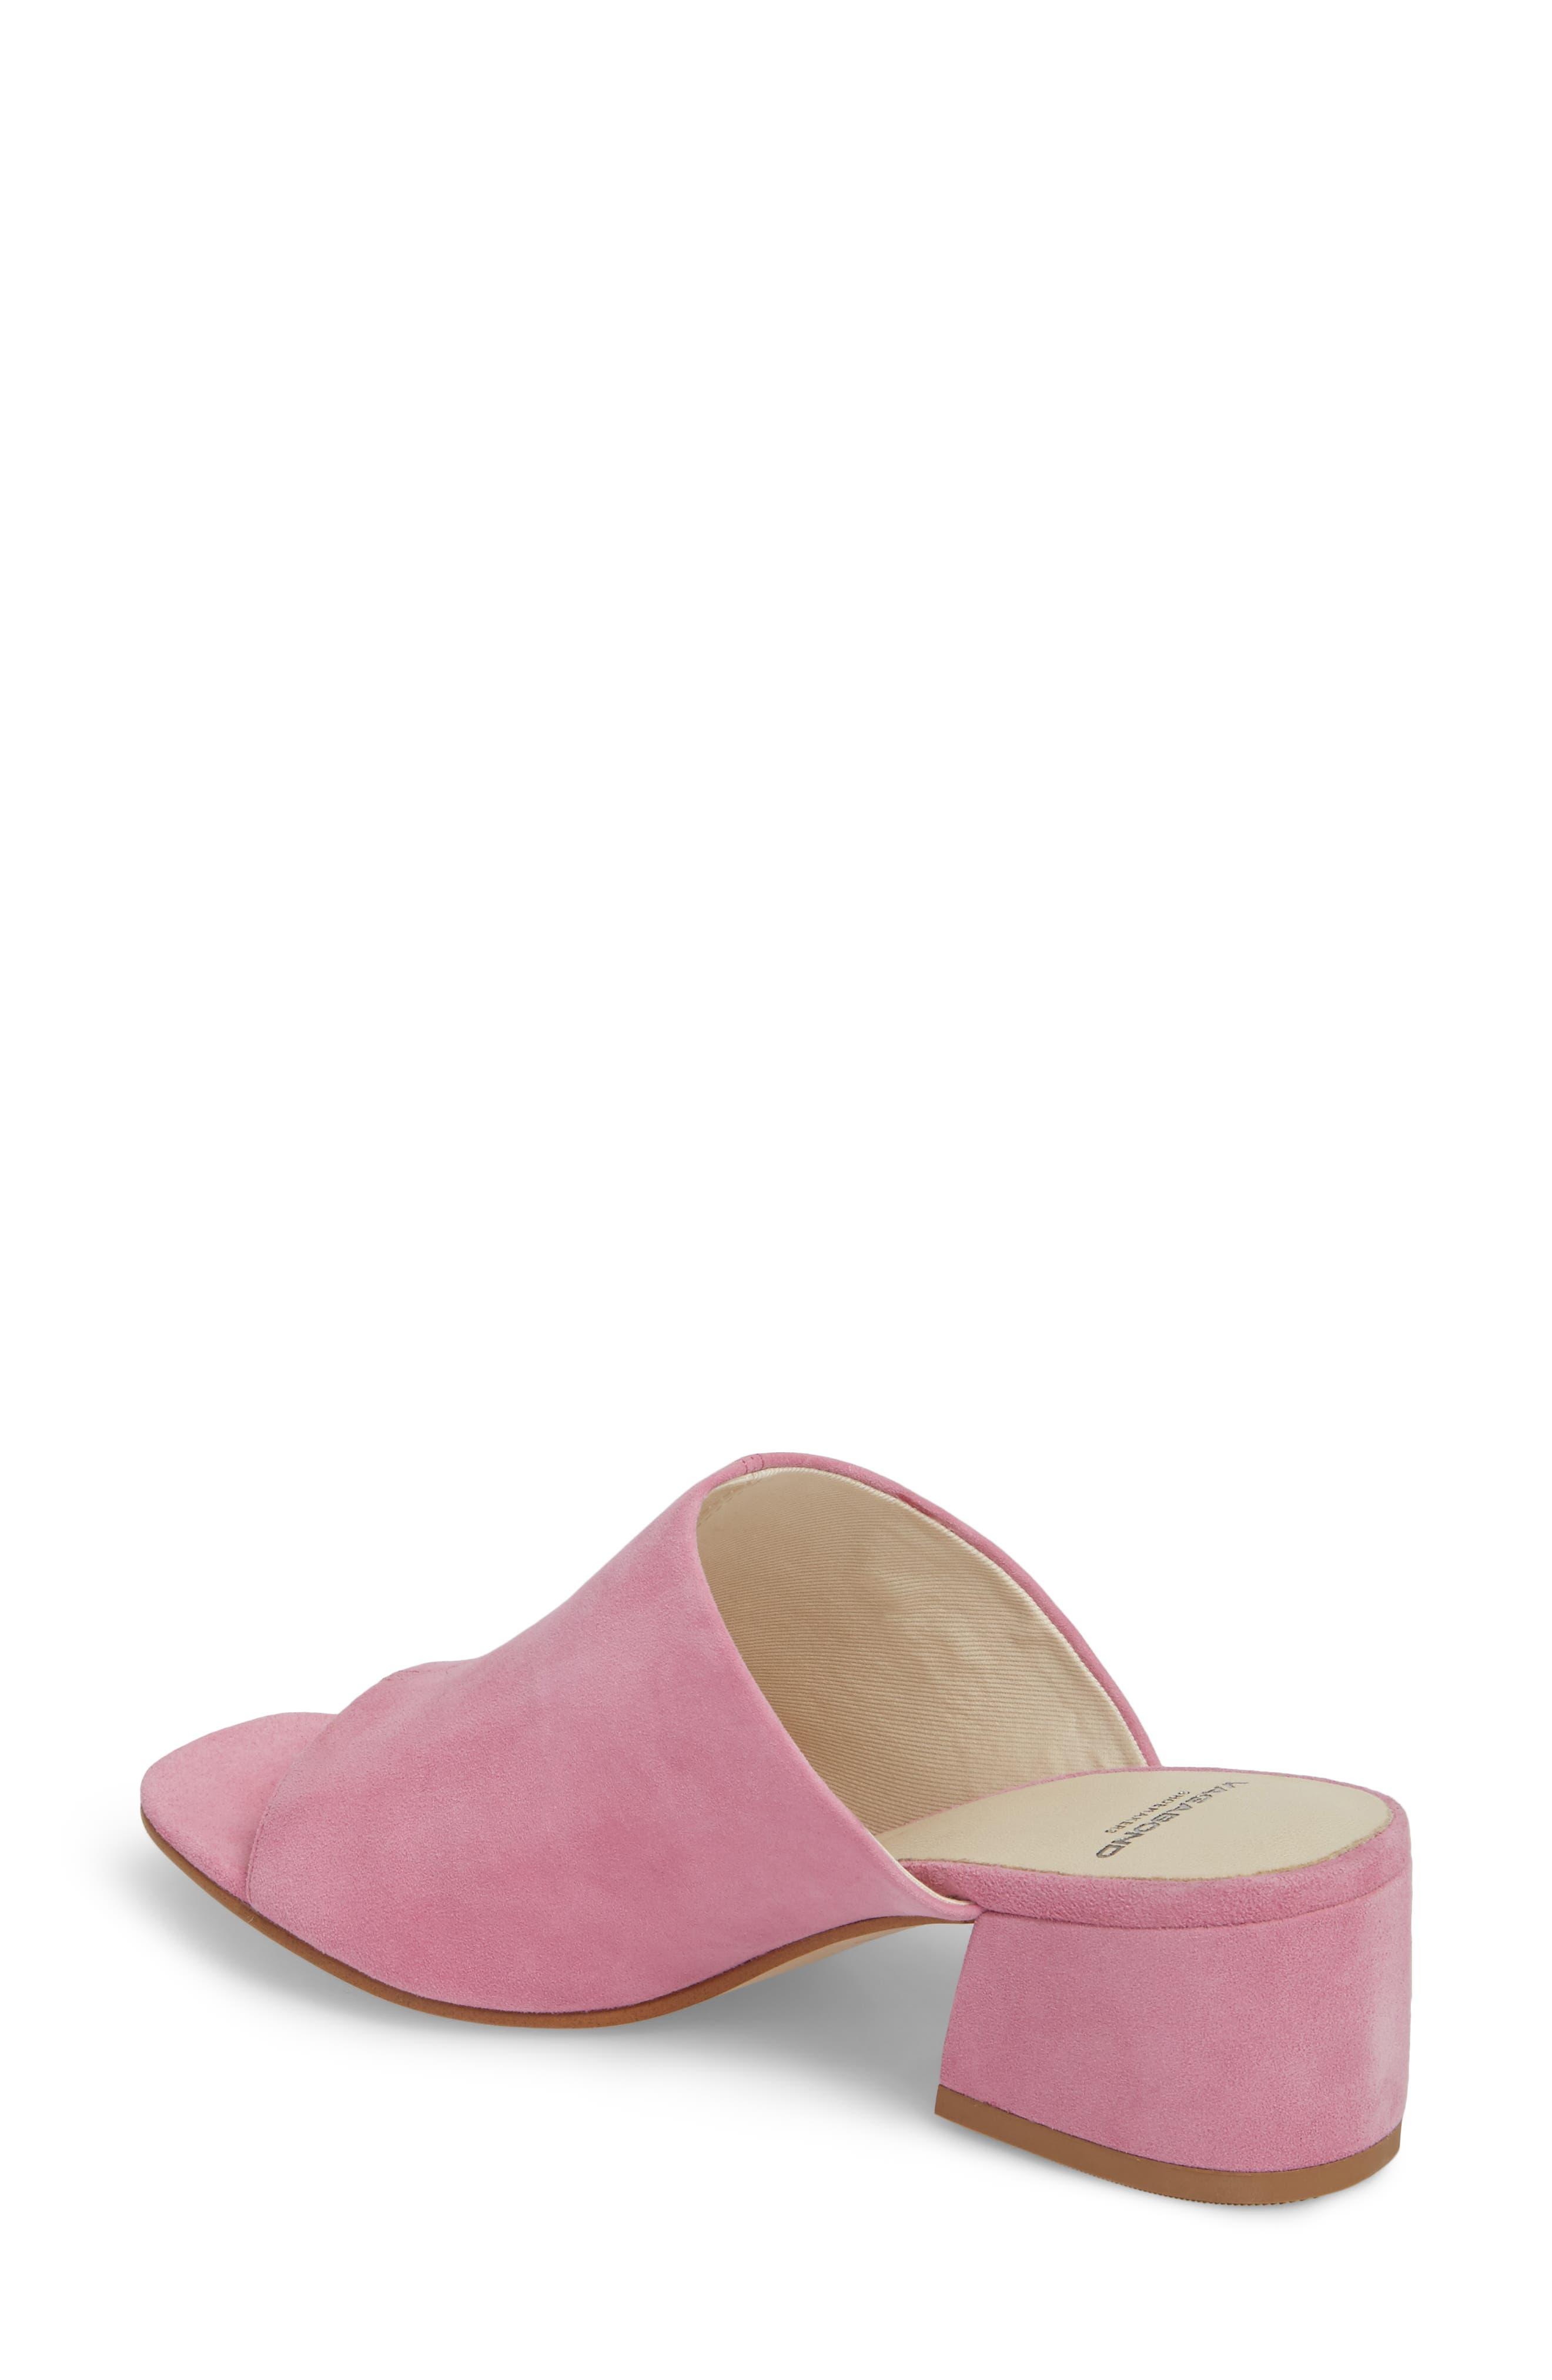 Saide Slide Sandal,                             Alternate thumbnail 2, color,                             Pink Suede